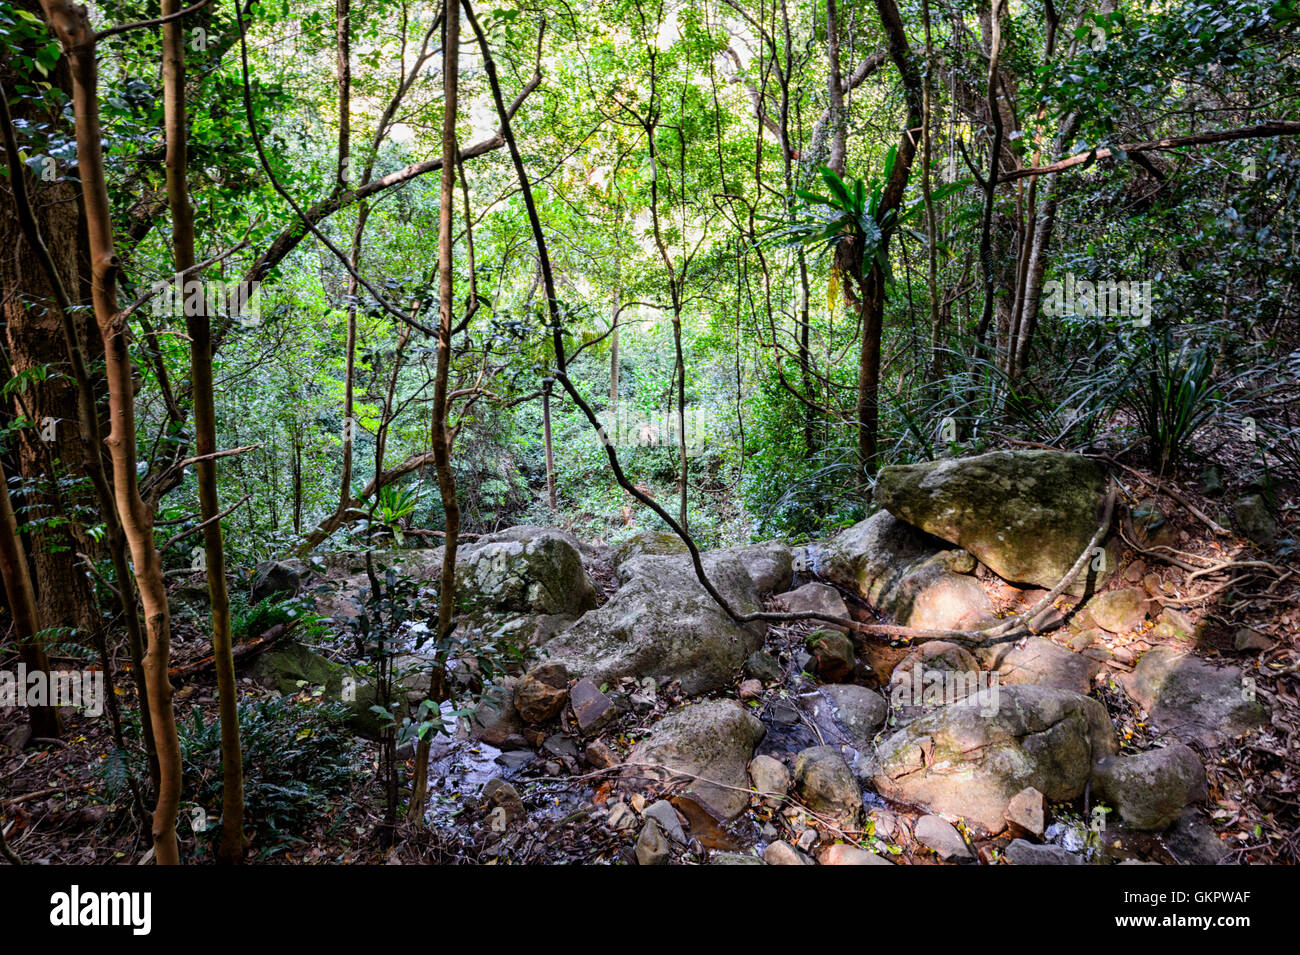 Lianen wachsen in den gemäßigten Minnamurra Rainforest Centre, New South Wales, NSW, Australien Stockbild